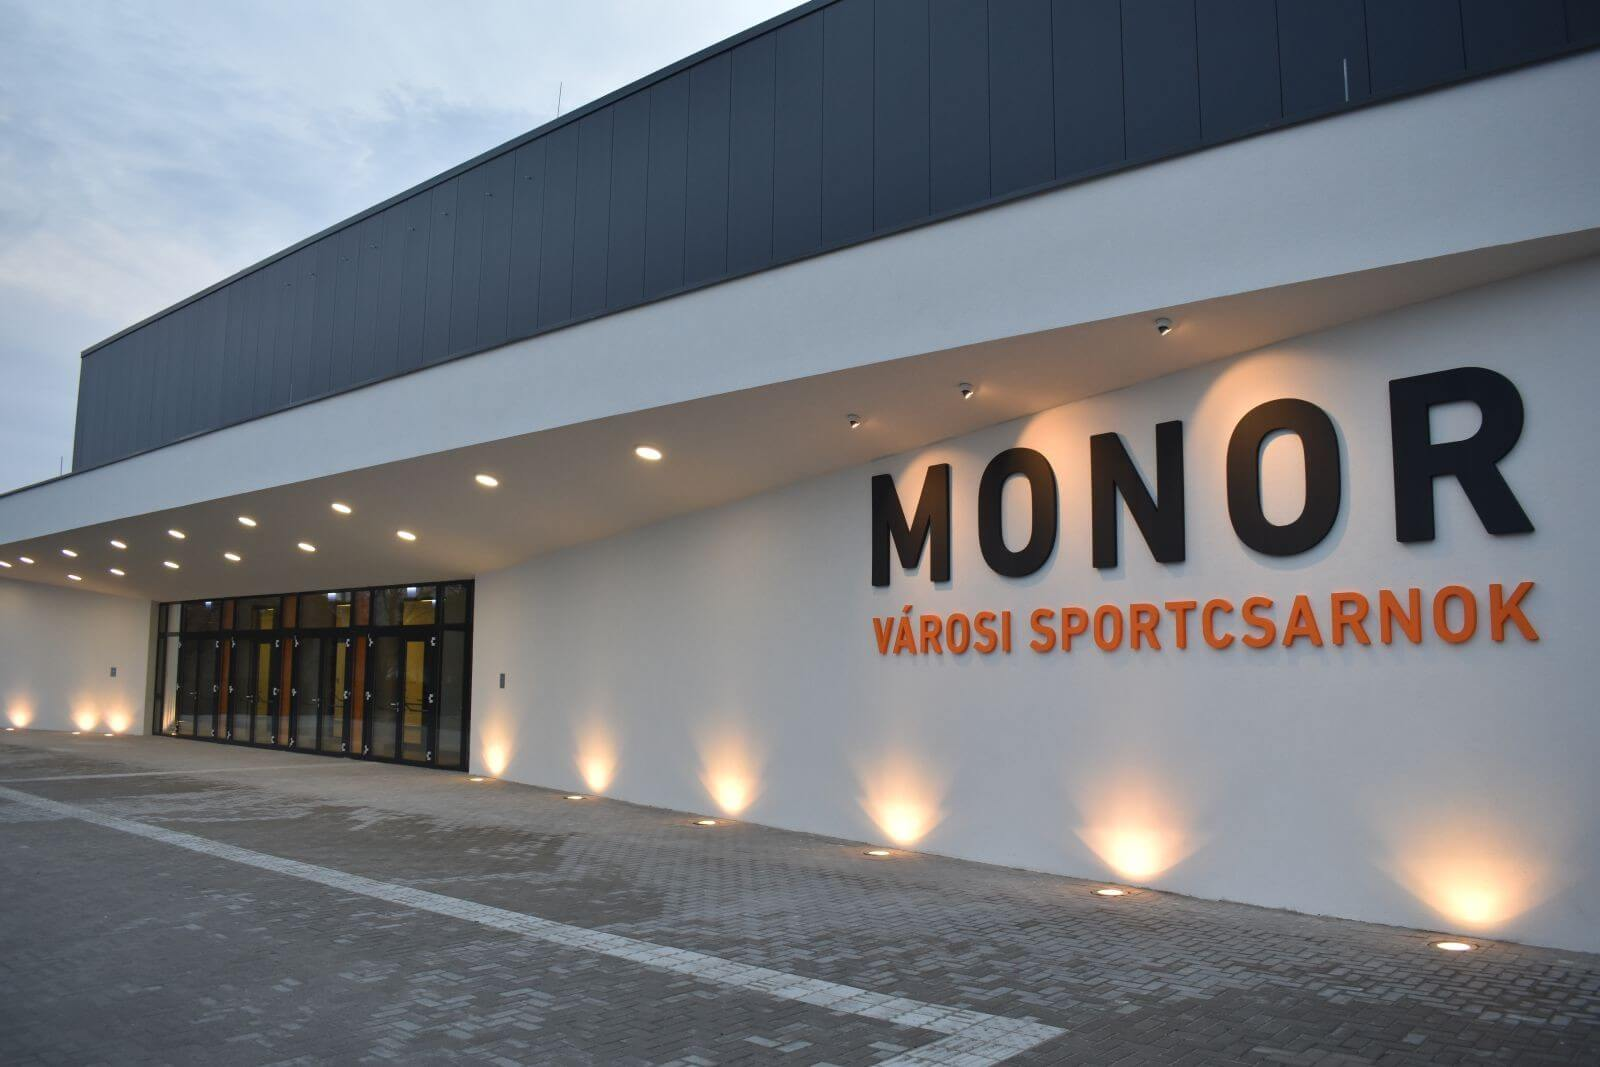 Új sportcsarnokot kapott Monor